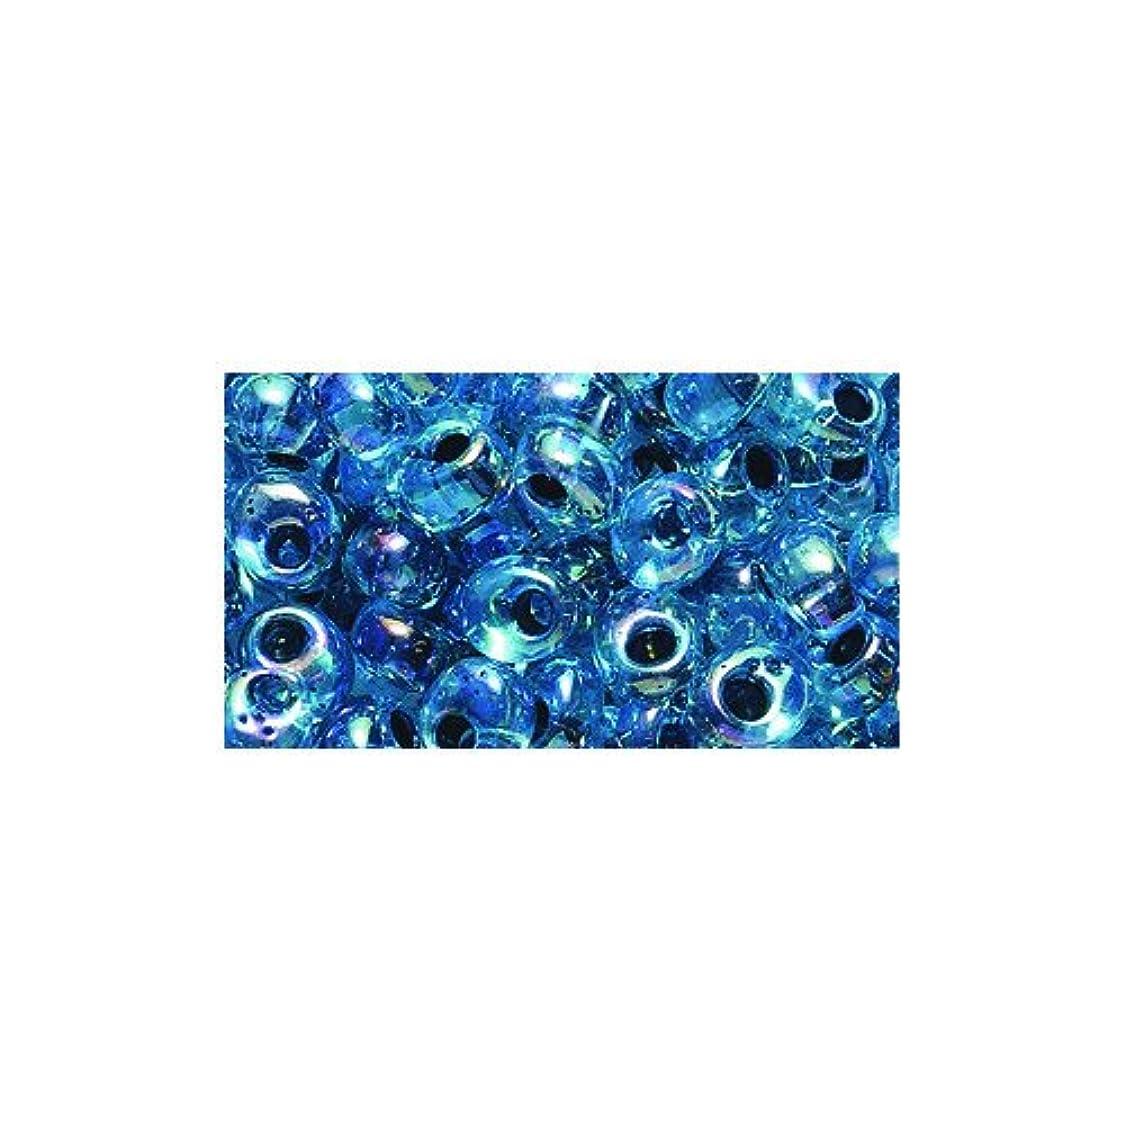 Shipwreck Beads Miyuki Seed Bead, Drop Magatama Topaz Lined Aqua Aurora Borealis, 4mm bt02169223306050